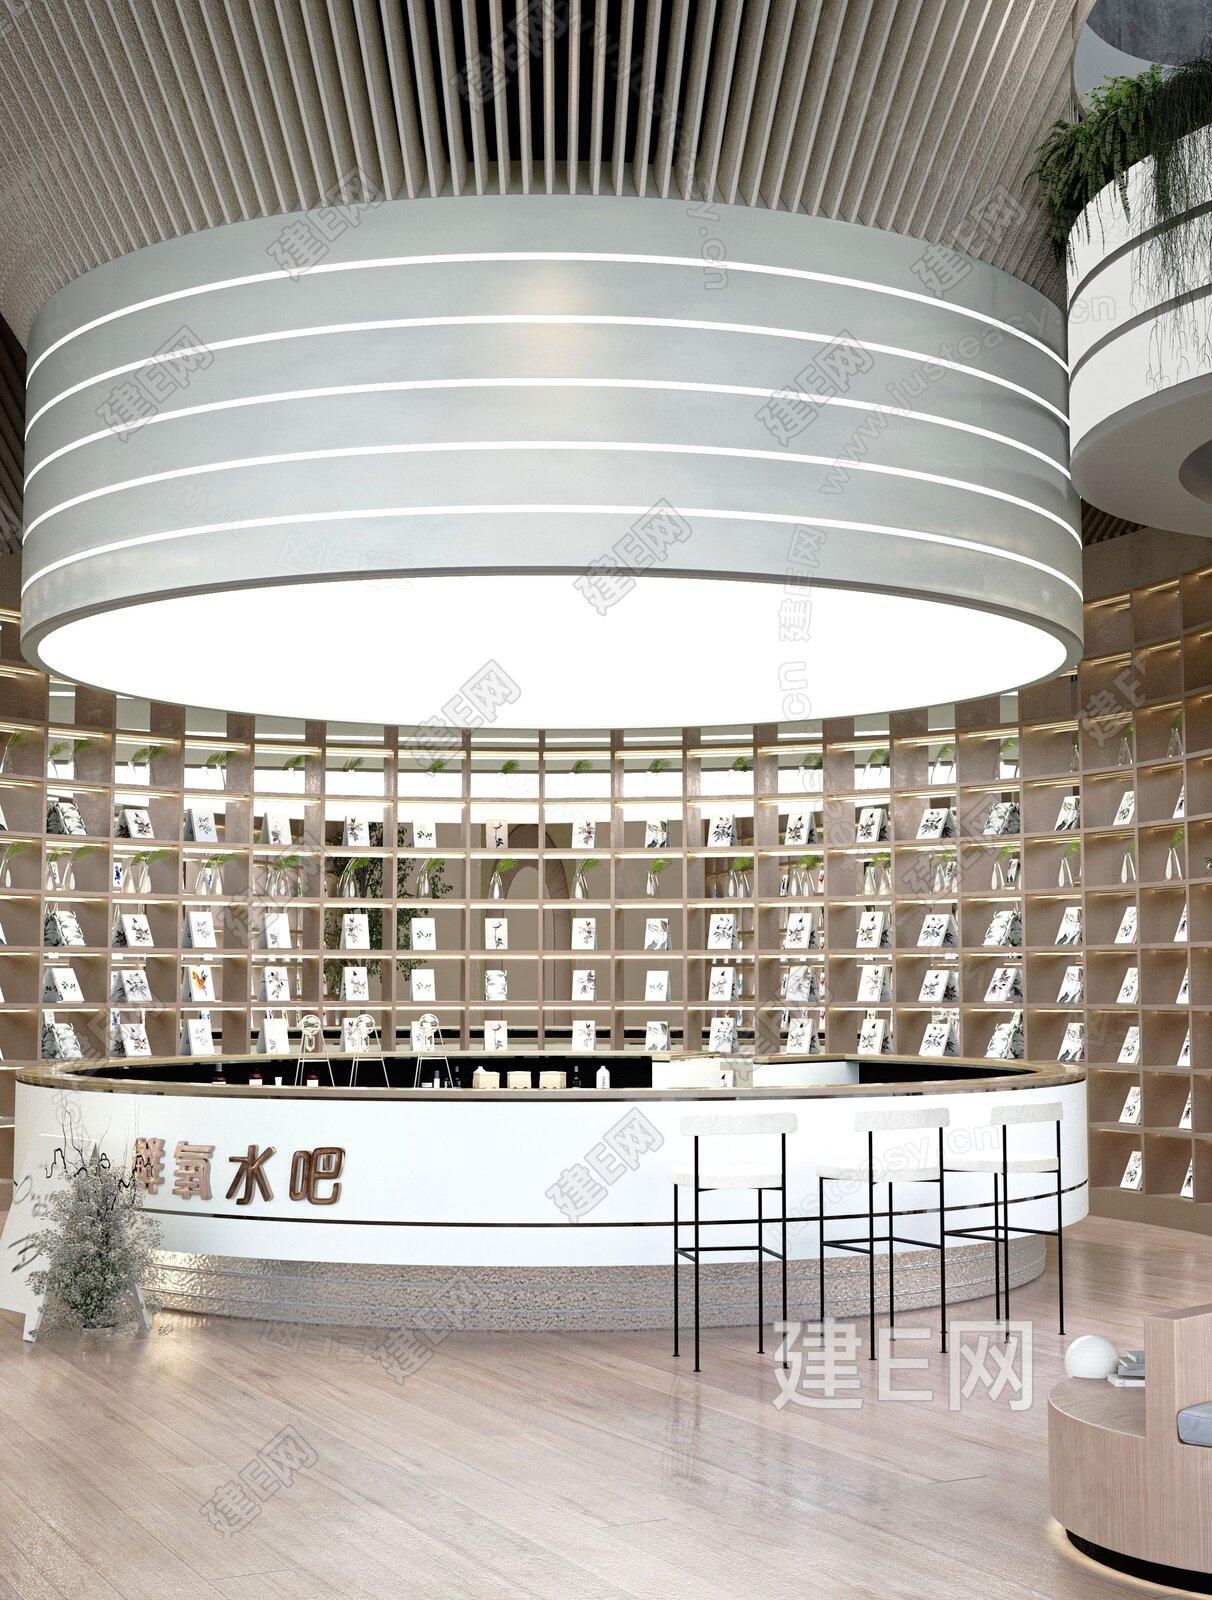 MOD墨设设计 现代楼中心会客区3d模型